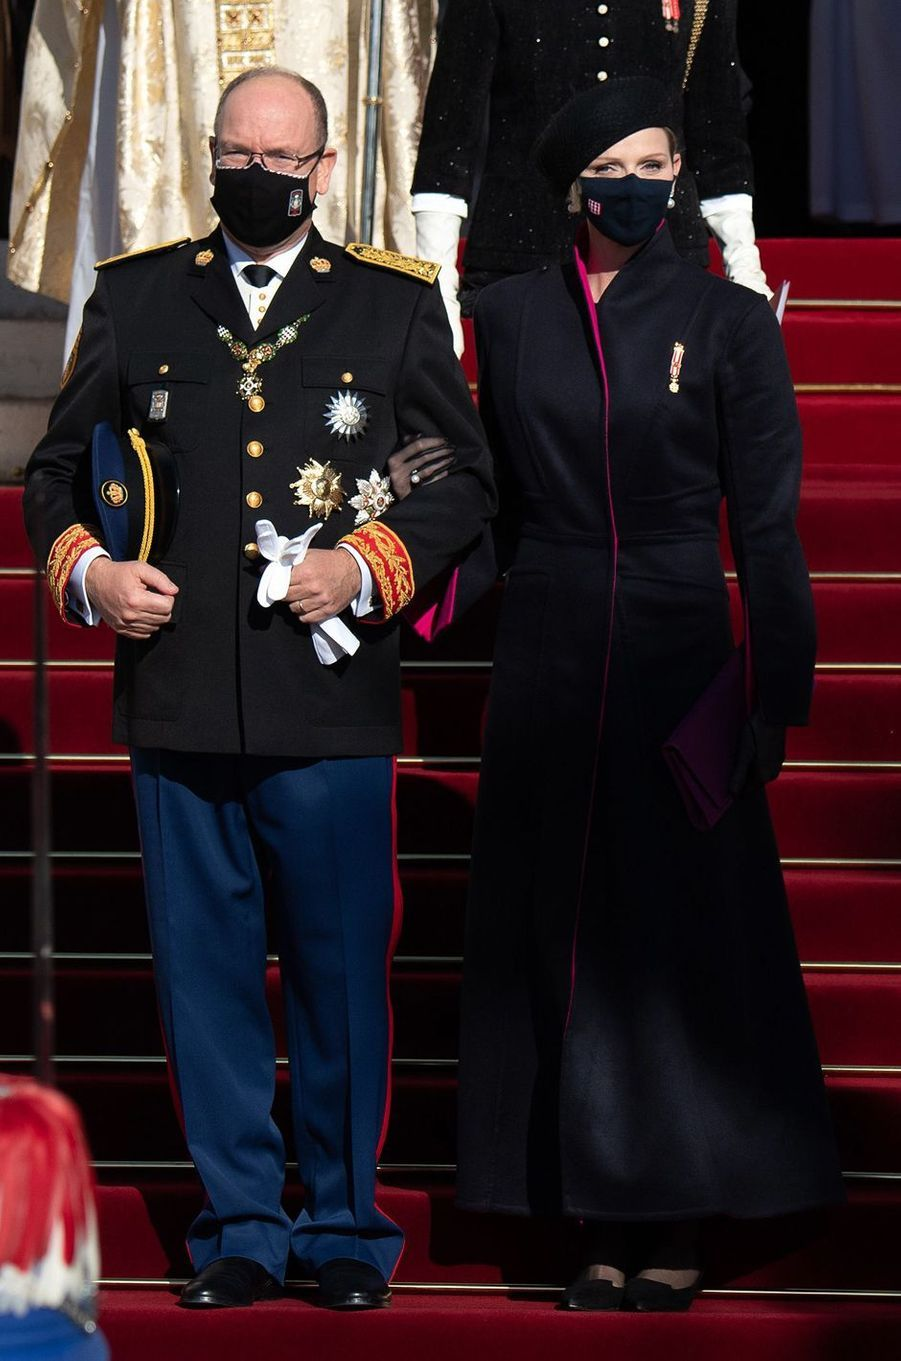 La princesse Charlène de Monaco en Terrence Bray, le 19 novembre 2020